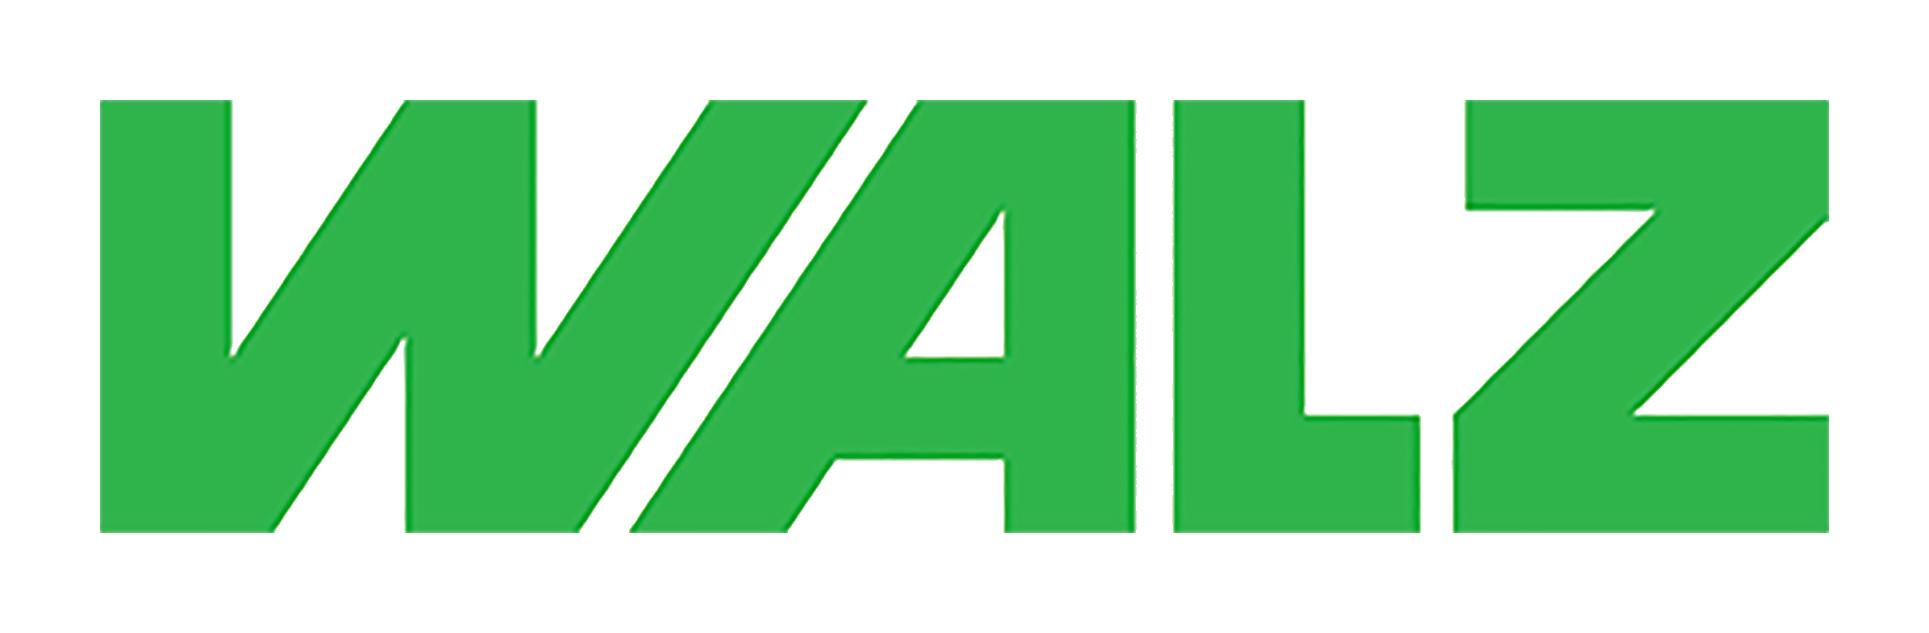 WALZ, GmbH fluorometers and gas exchange instruments